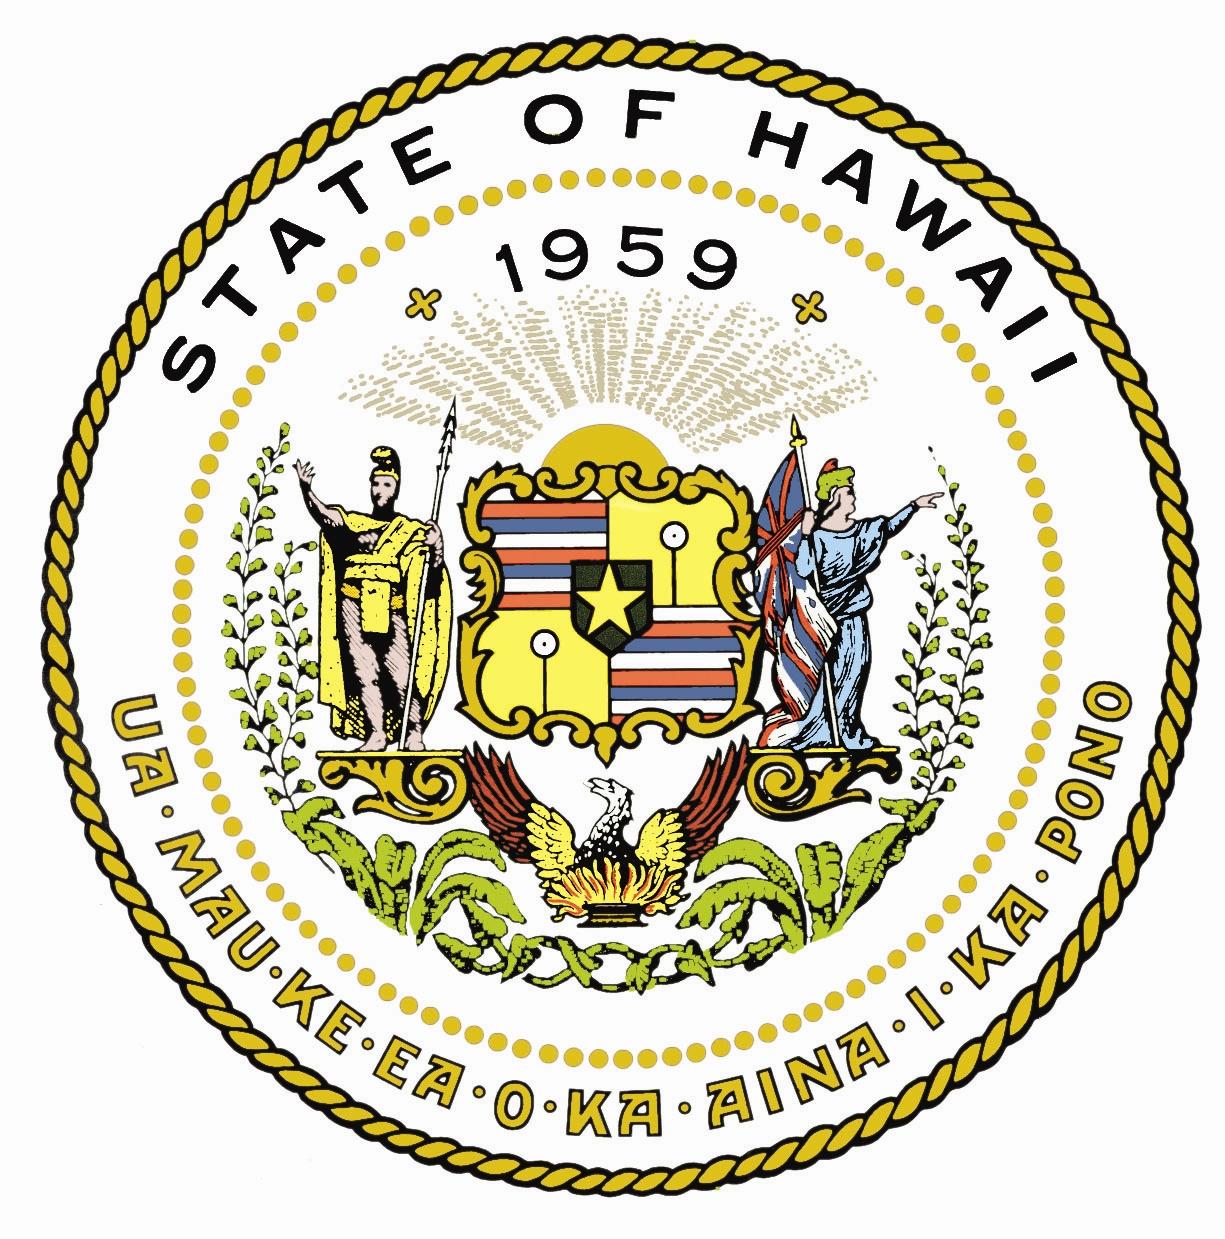 State of Hawaii seal-logo